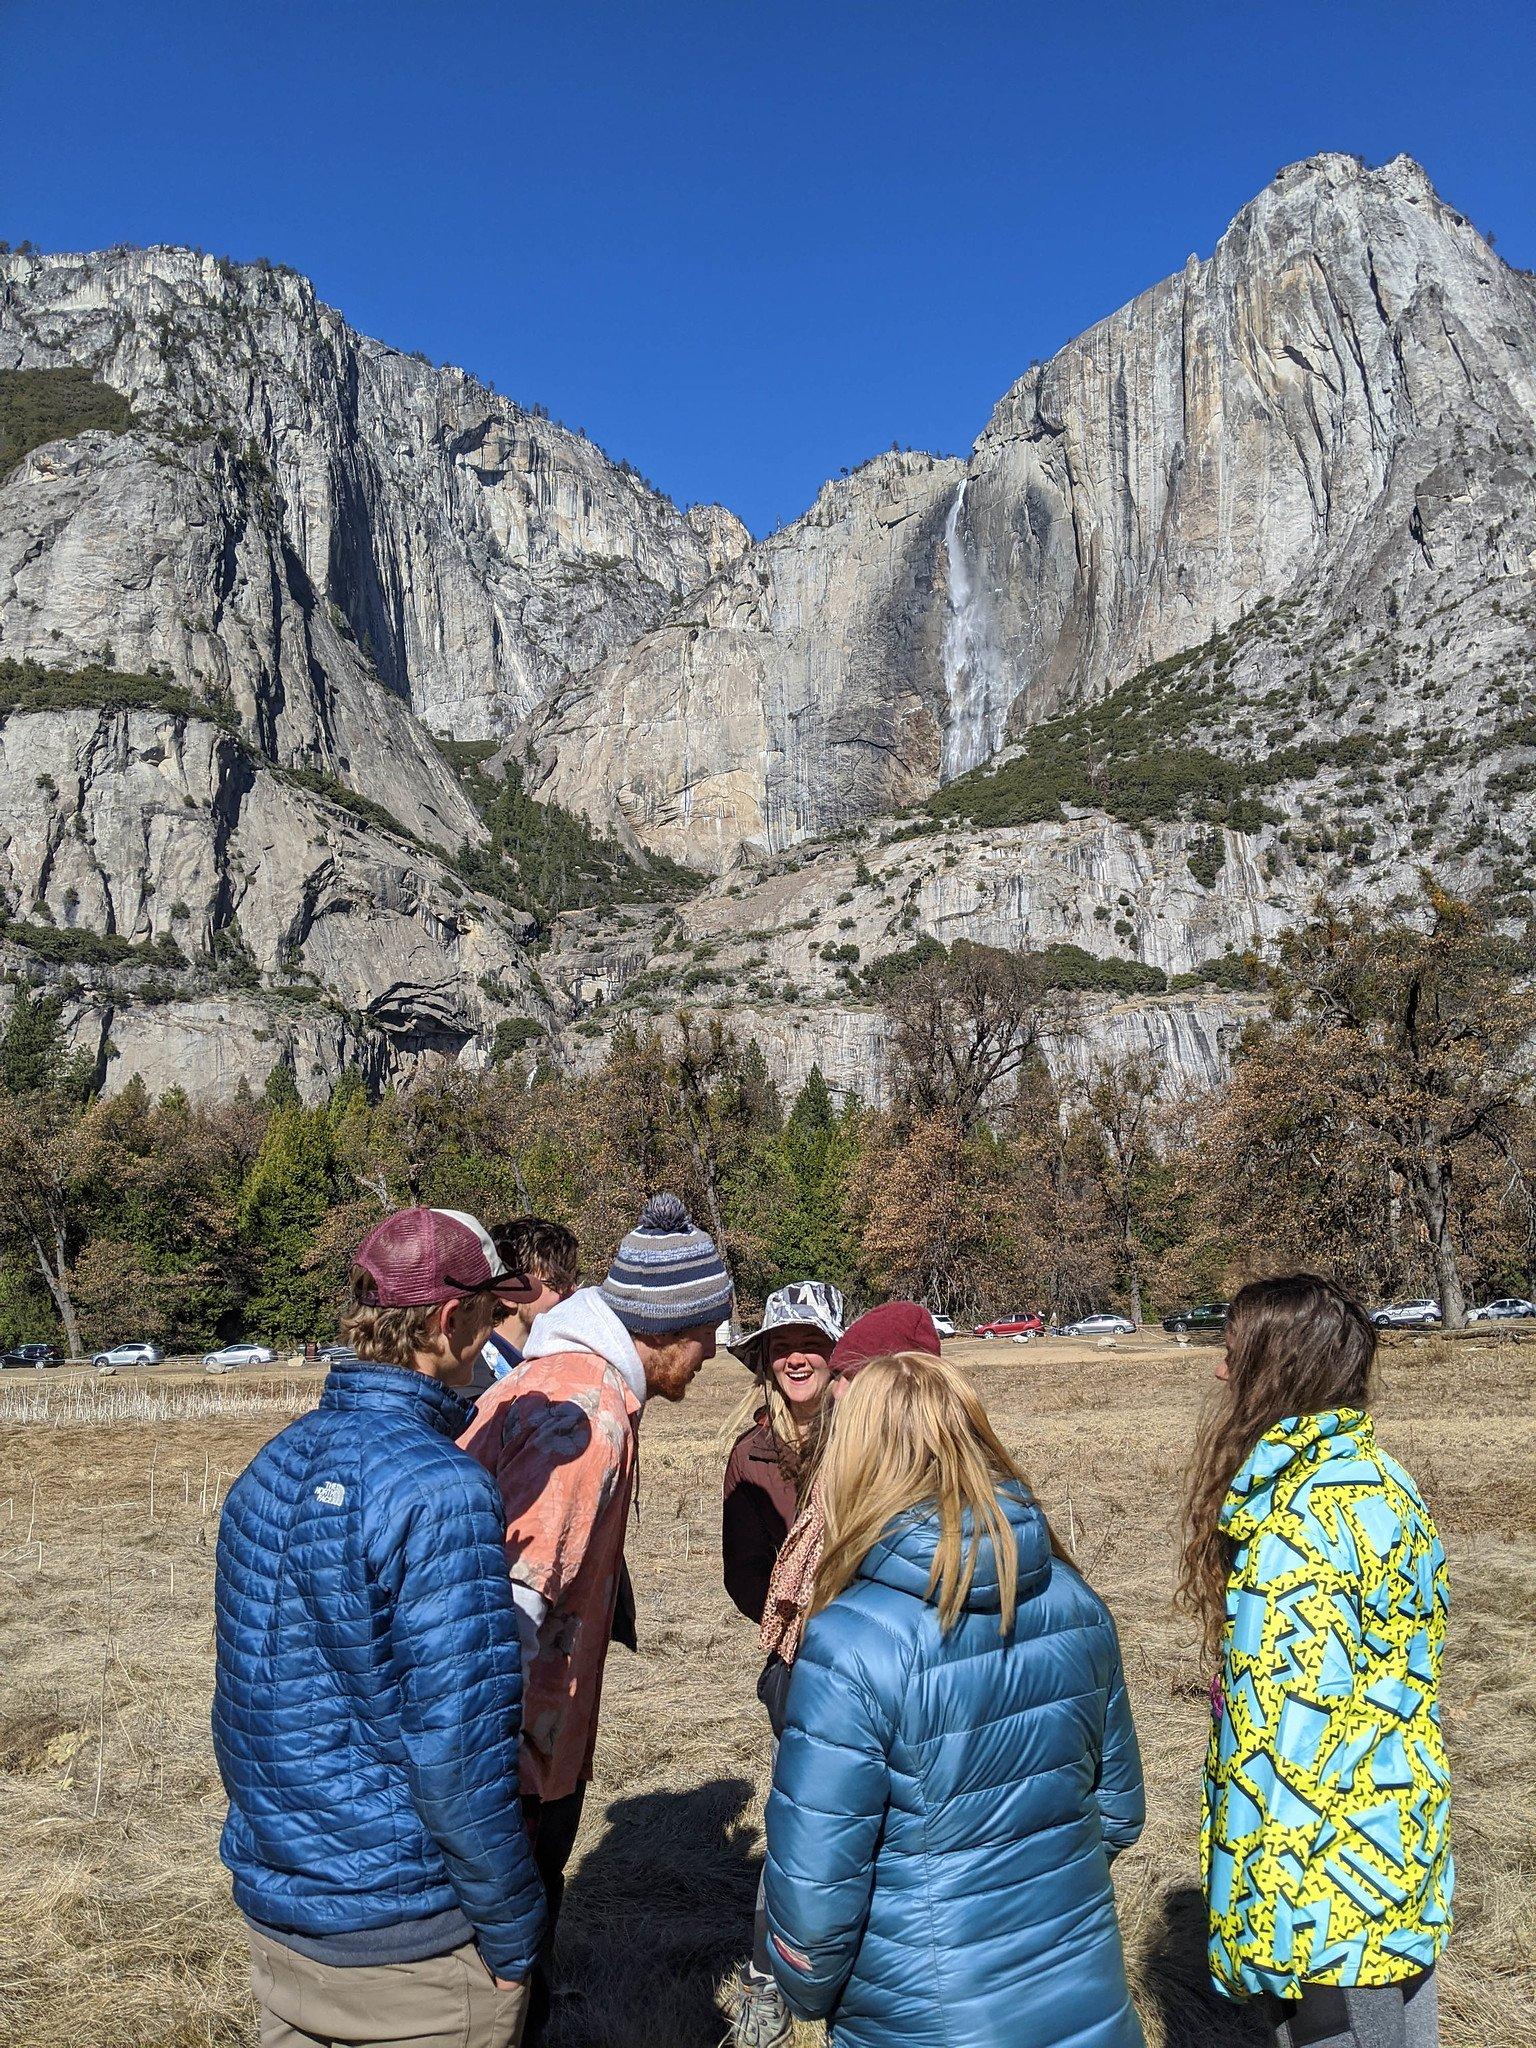 Proctor Academy Mountain Classroom Boarding School